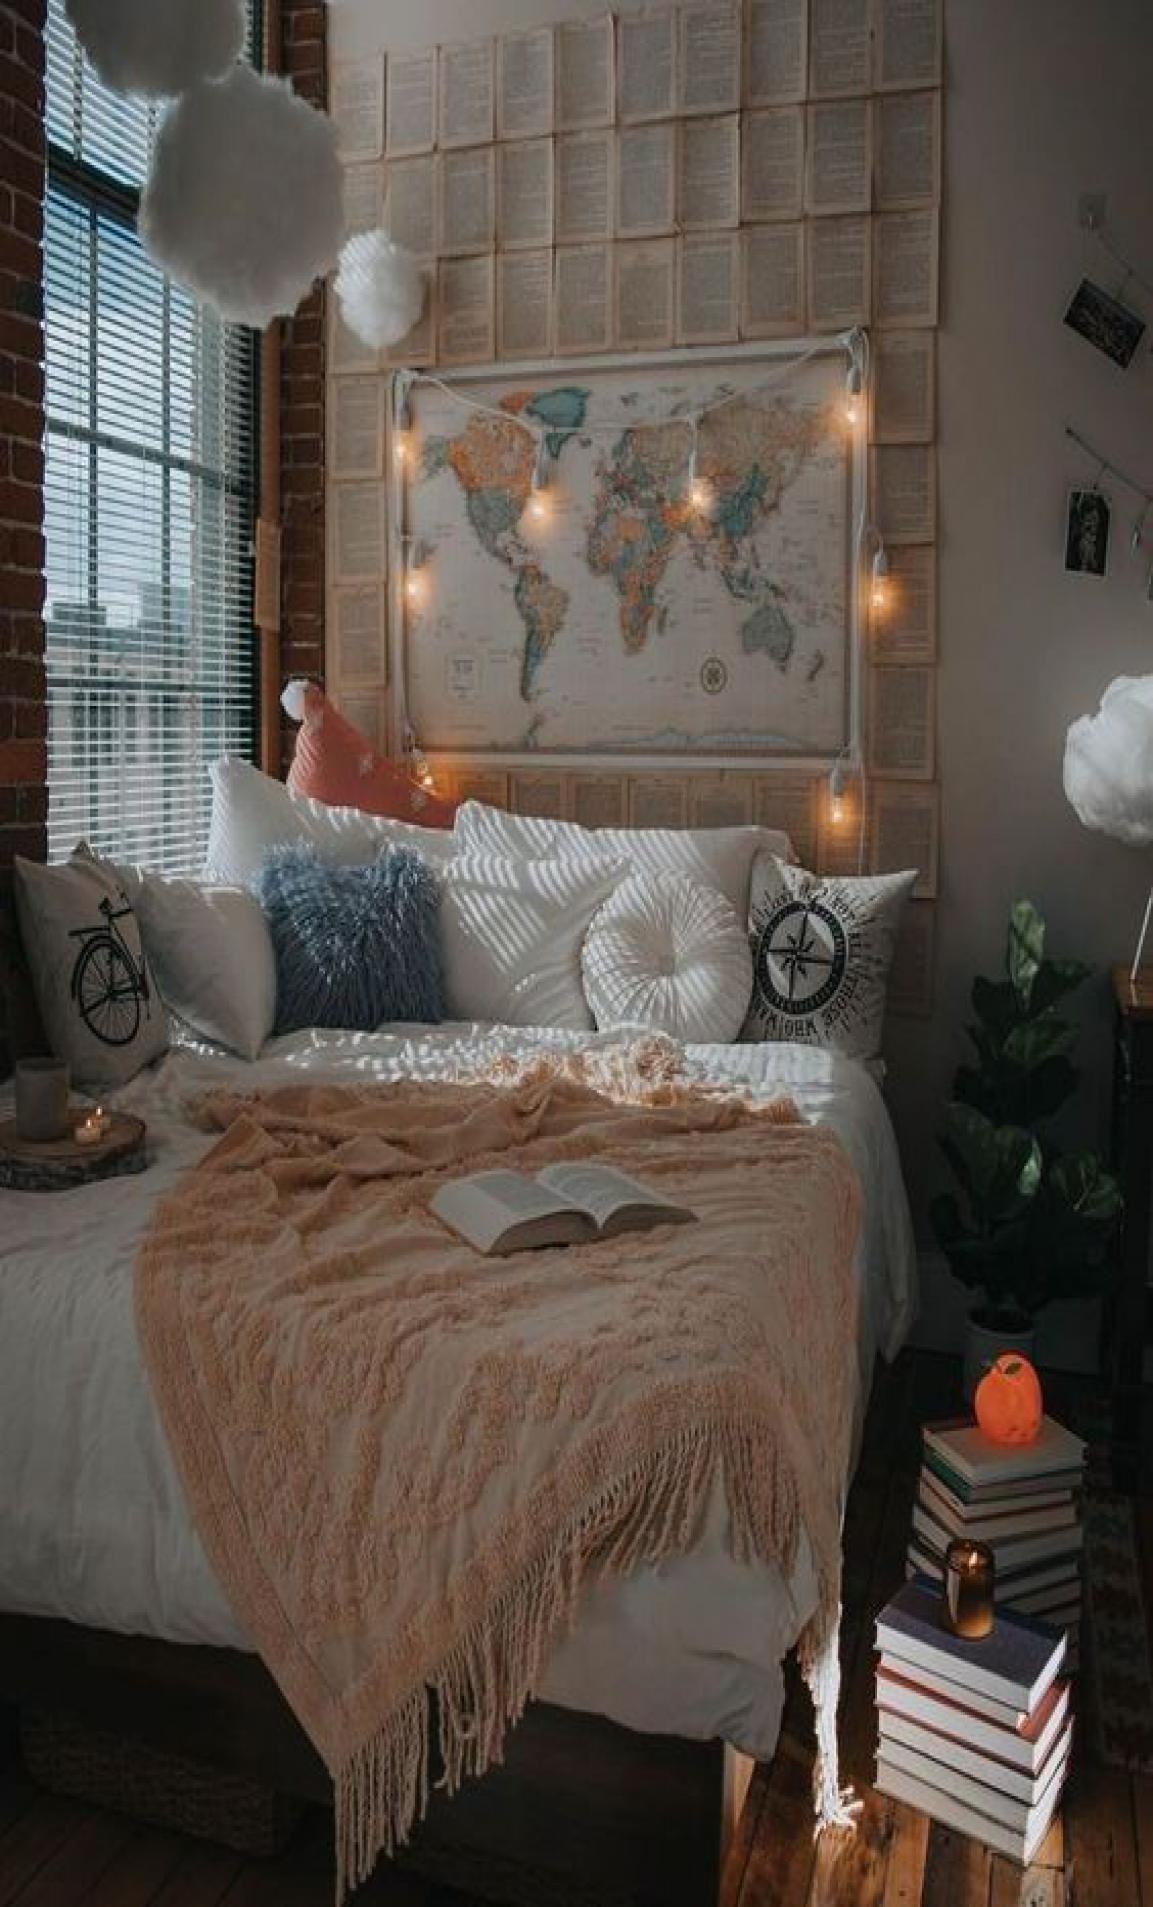 49 Fabulous Sport Bedroom Ideas For Boys Room Inspiration Bedroom Dorm Room Decor Bohemian Bedroom Design